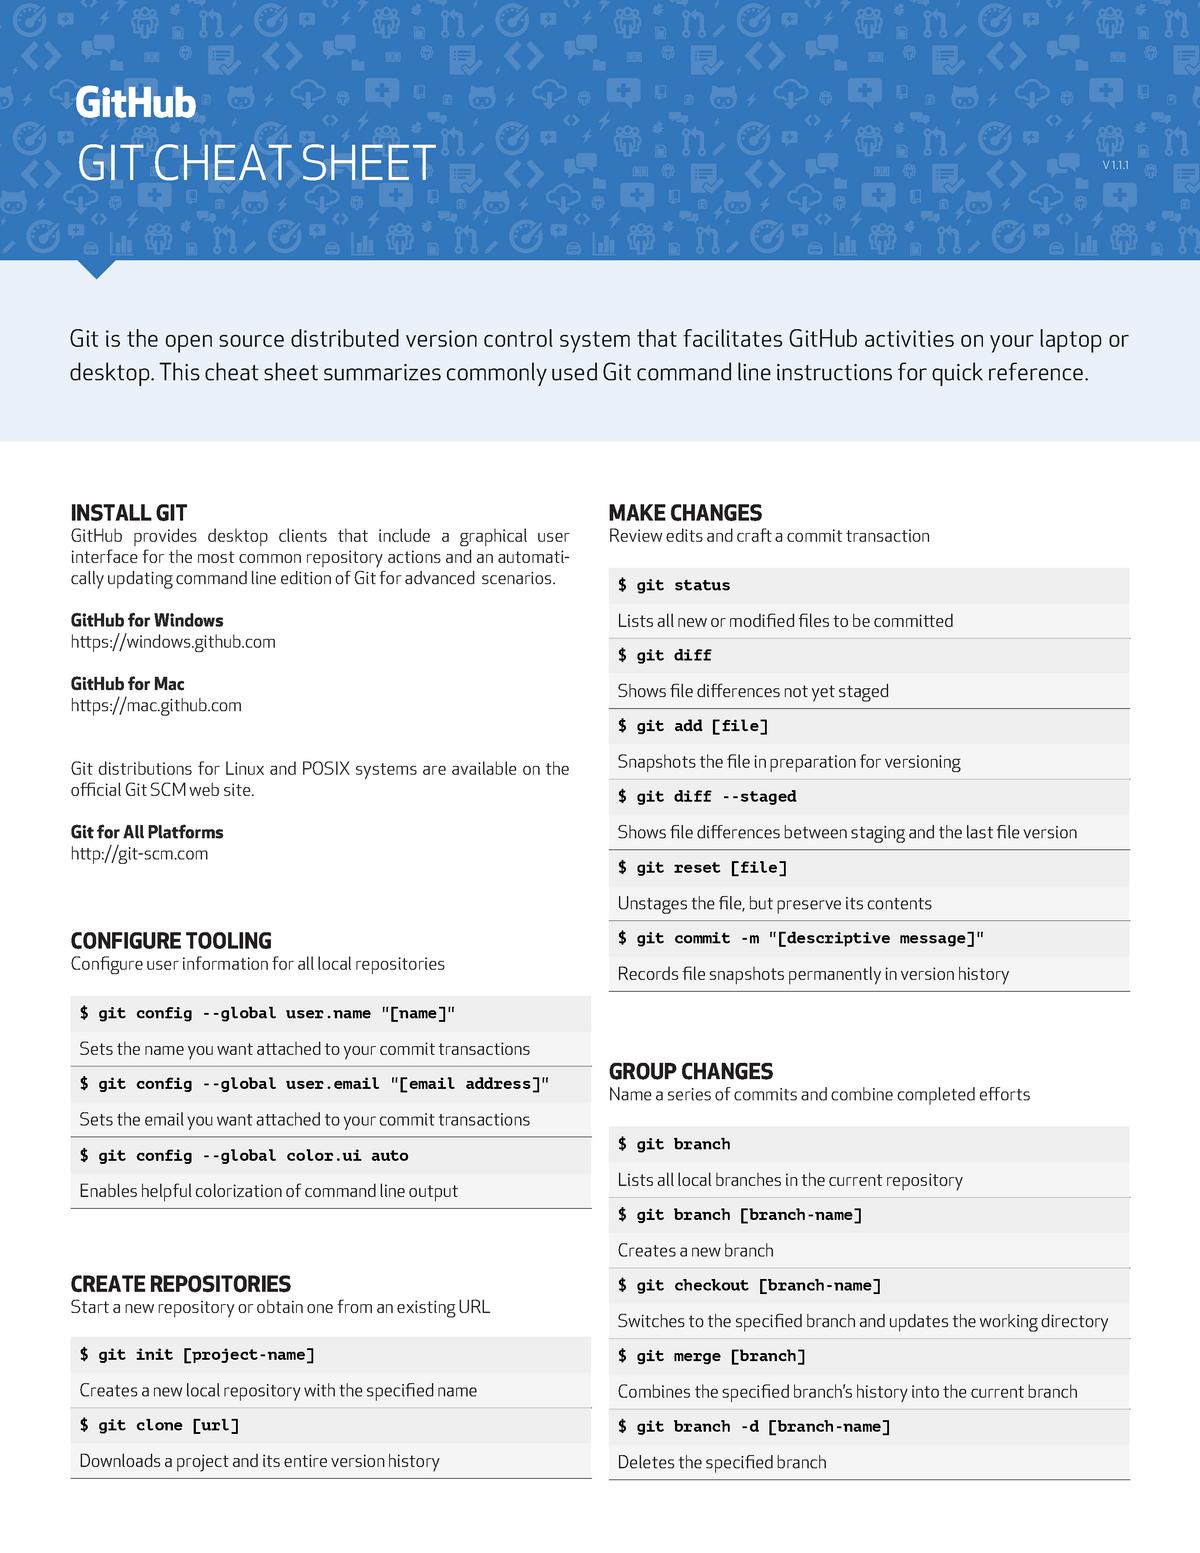 Github git cheat sheet - Git commands summary - Bachelor of